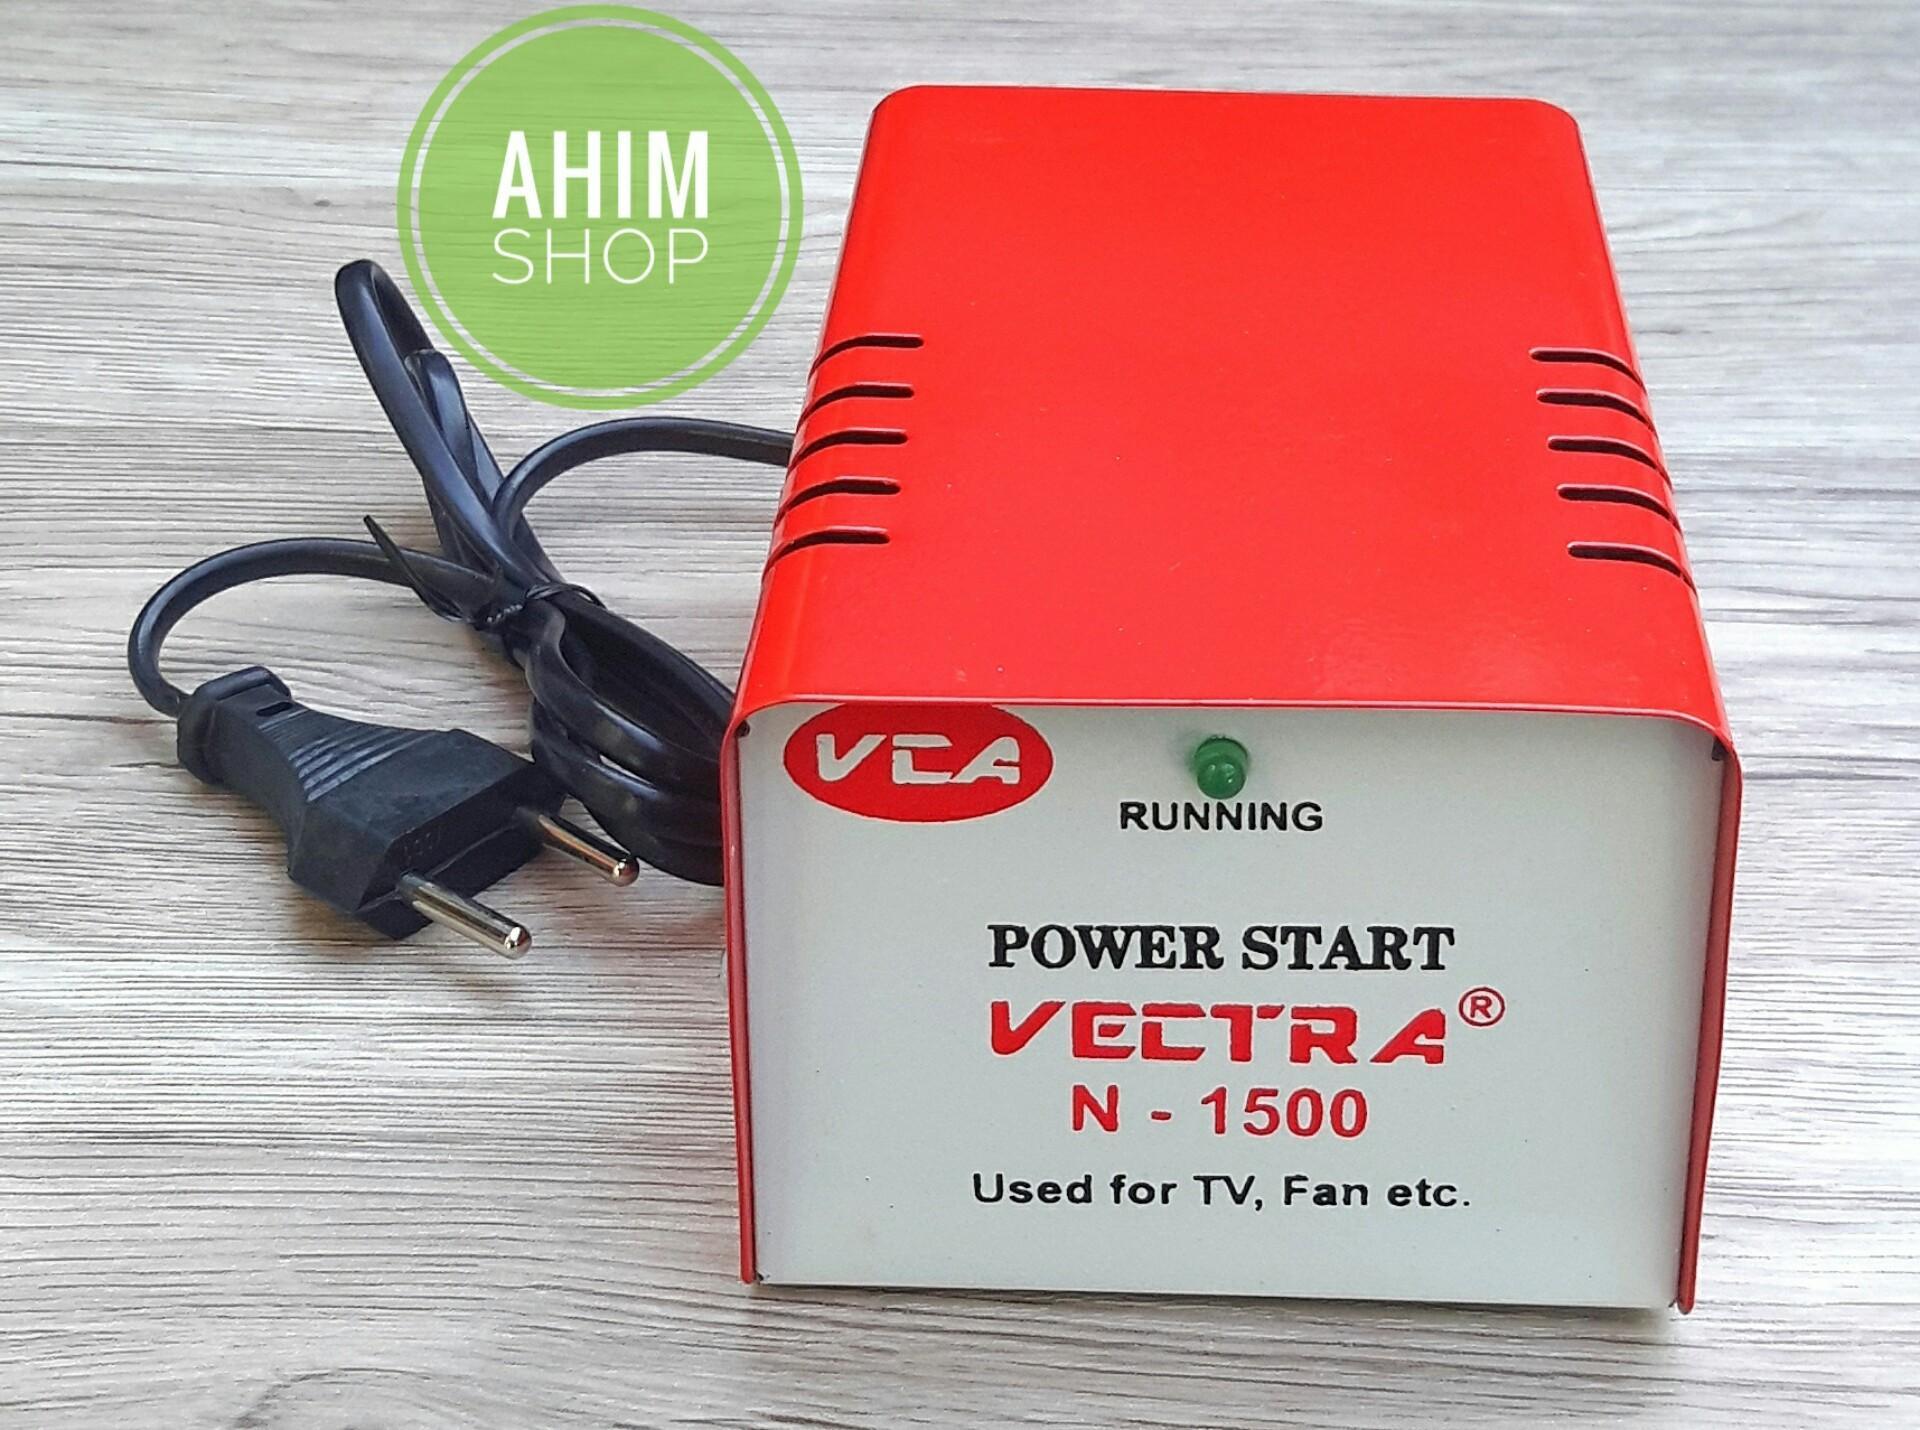 Fitur Vectra R Auto Start Dua Alat Elektronik Max 1500 W Body Besi Penghemat Listrik Power Plus Automatic Starting